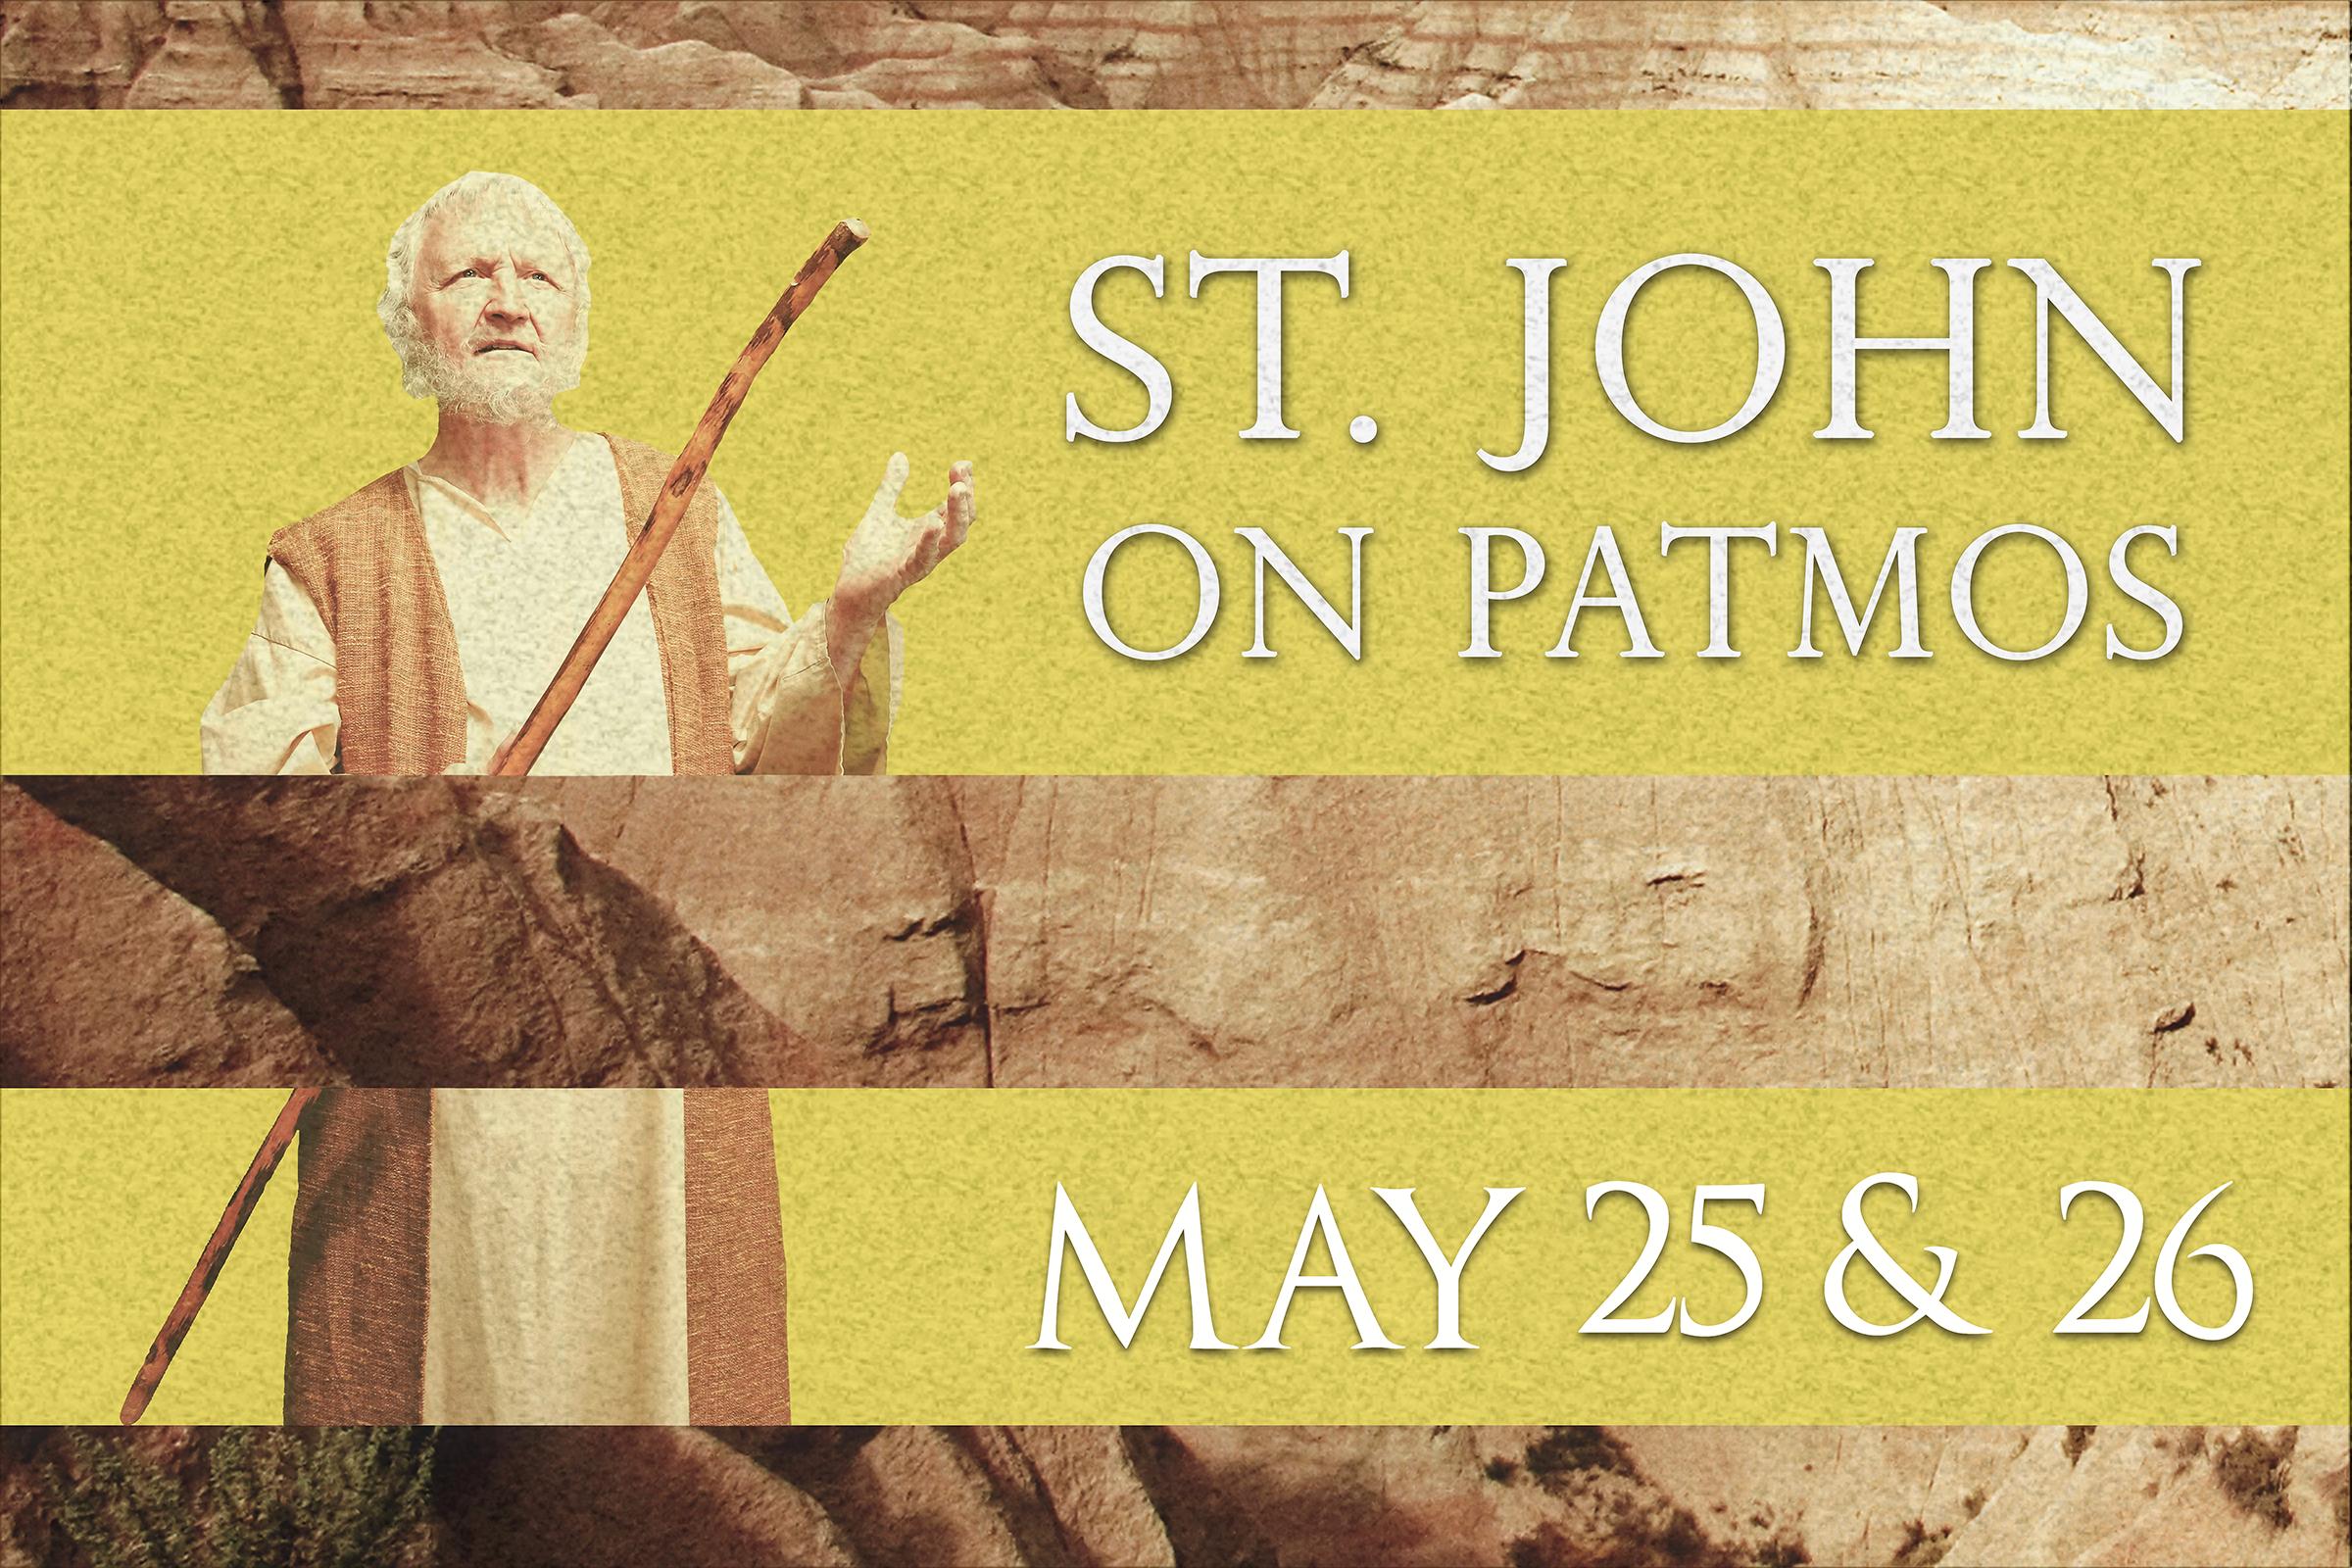 St. John Final resized.png